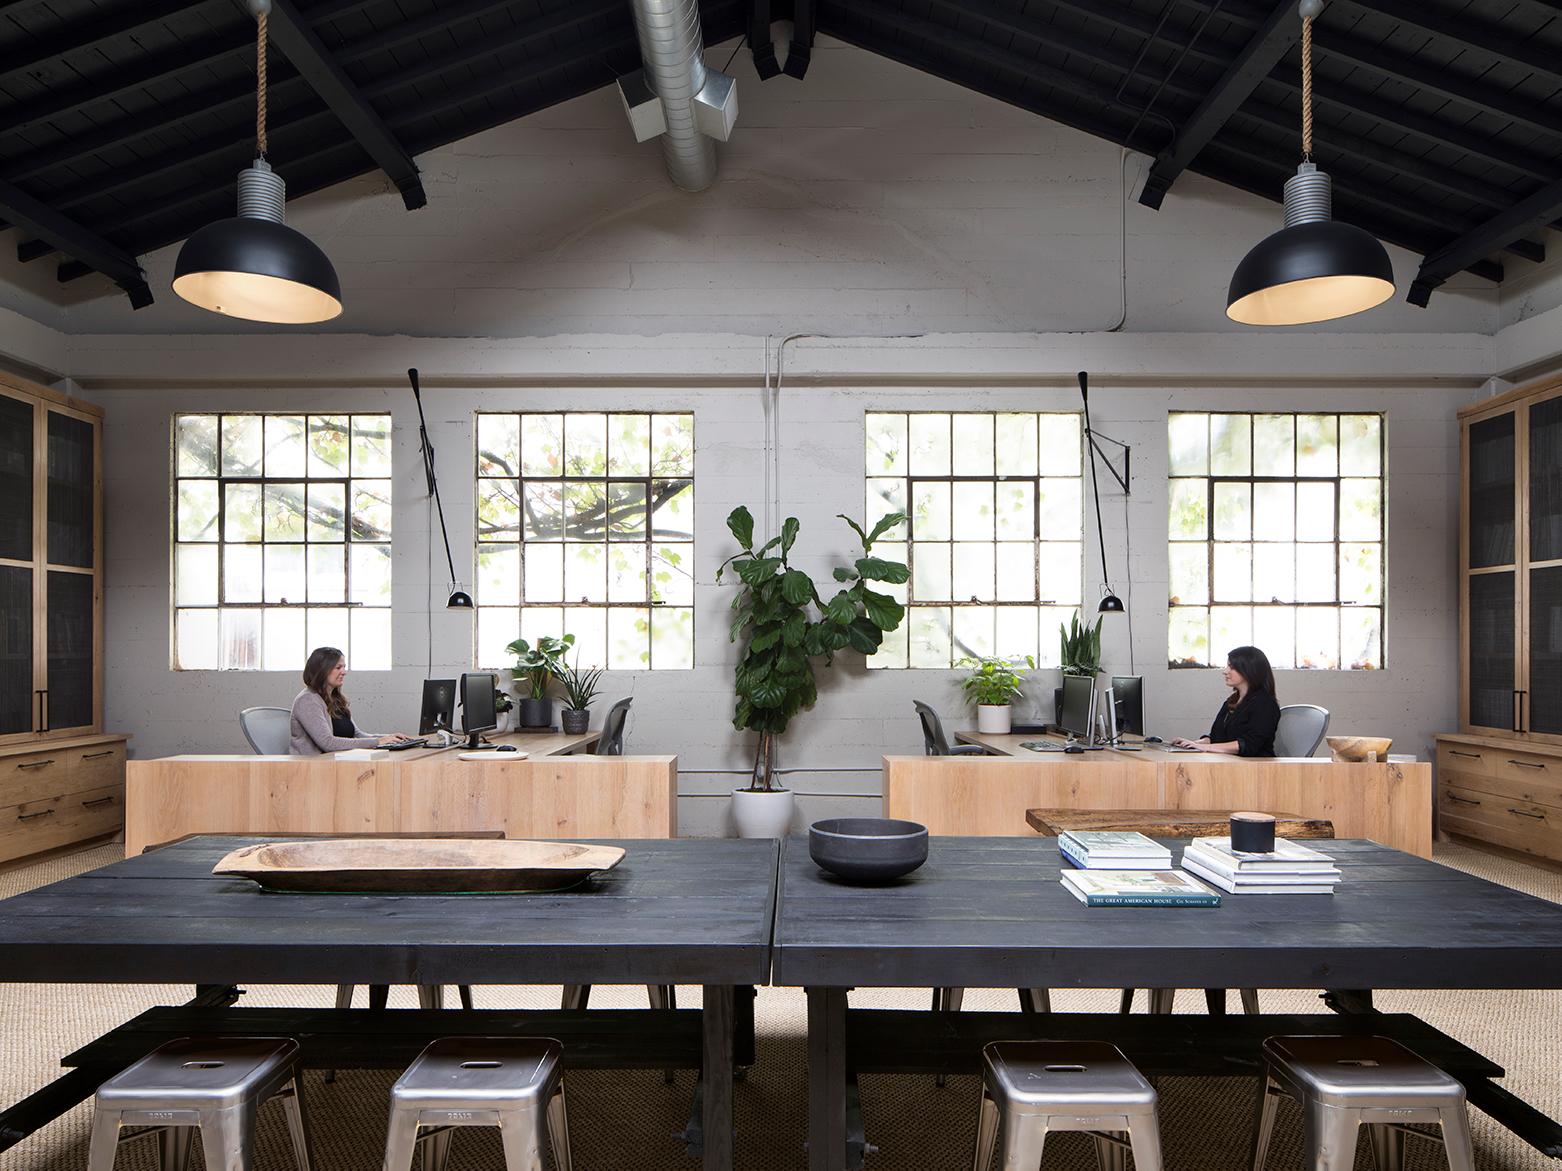 Jennifer_robins_interiors_projects_studio_2JR_Office_15_HR_desks